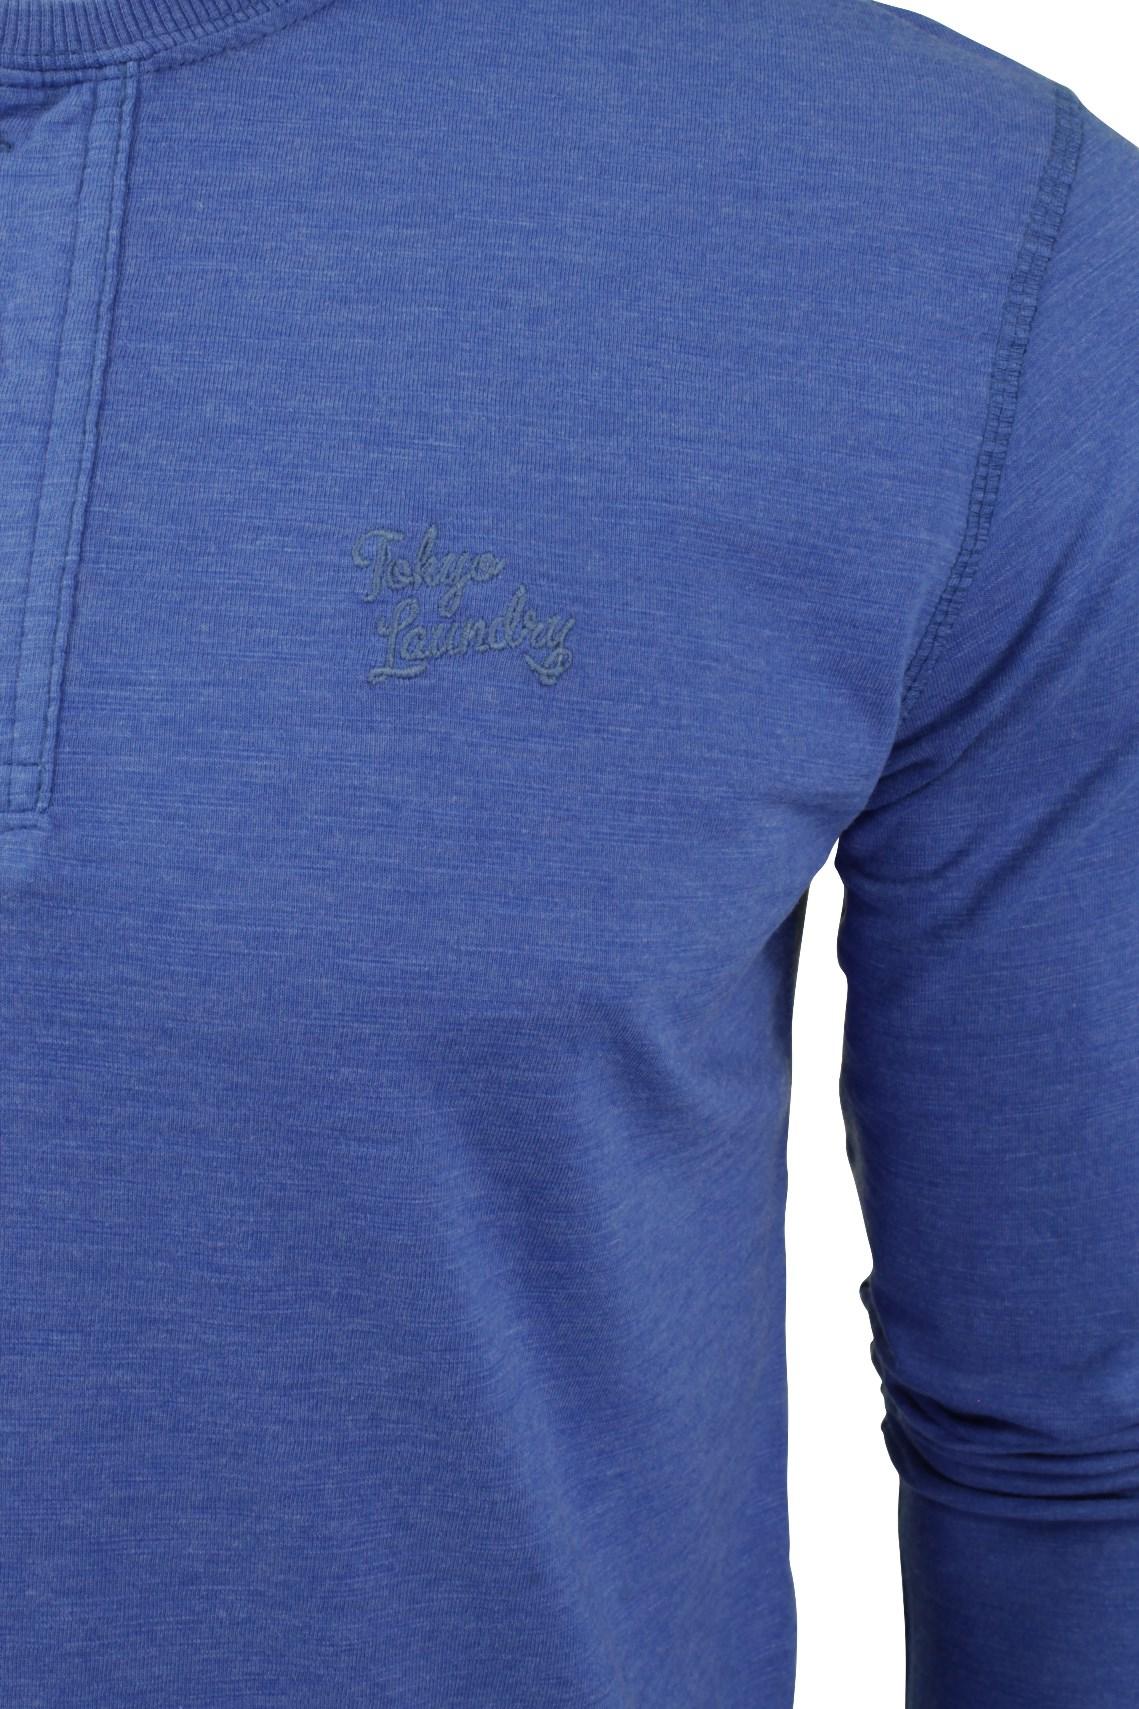 Mens-Grandad-T-Shirt-by-Tokyo-Laundry-039-Lawton-Cove-039-Long-Sleeved thumbnail 4